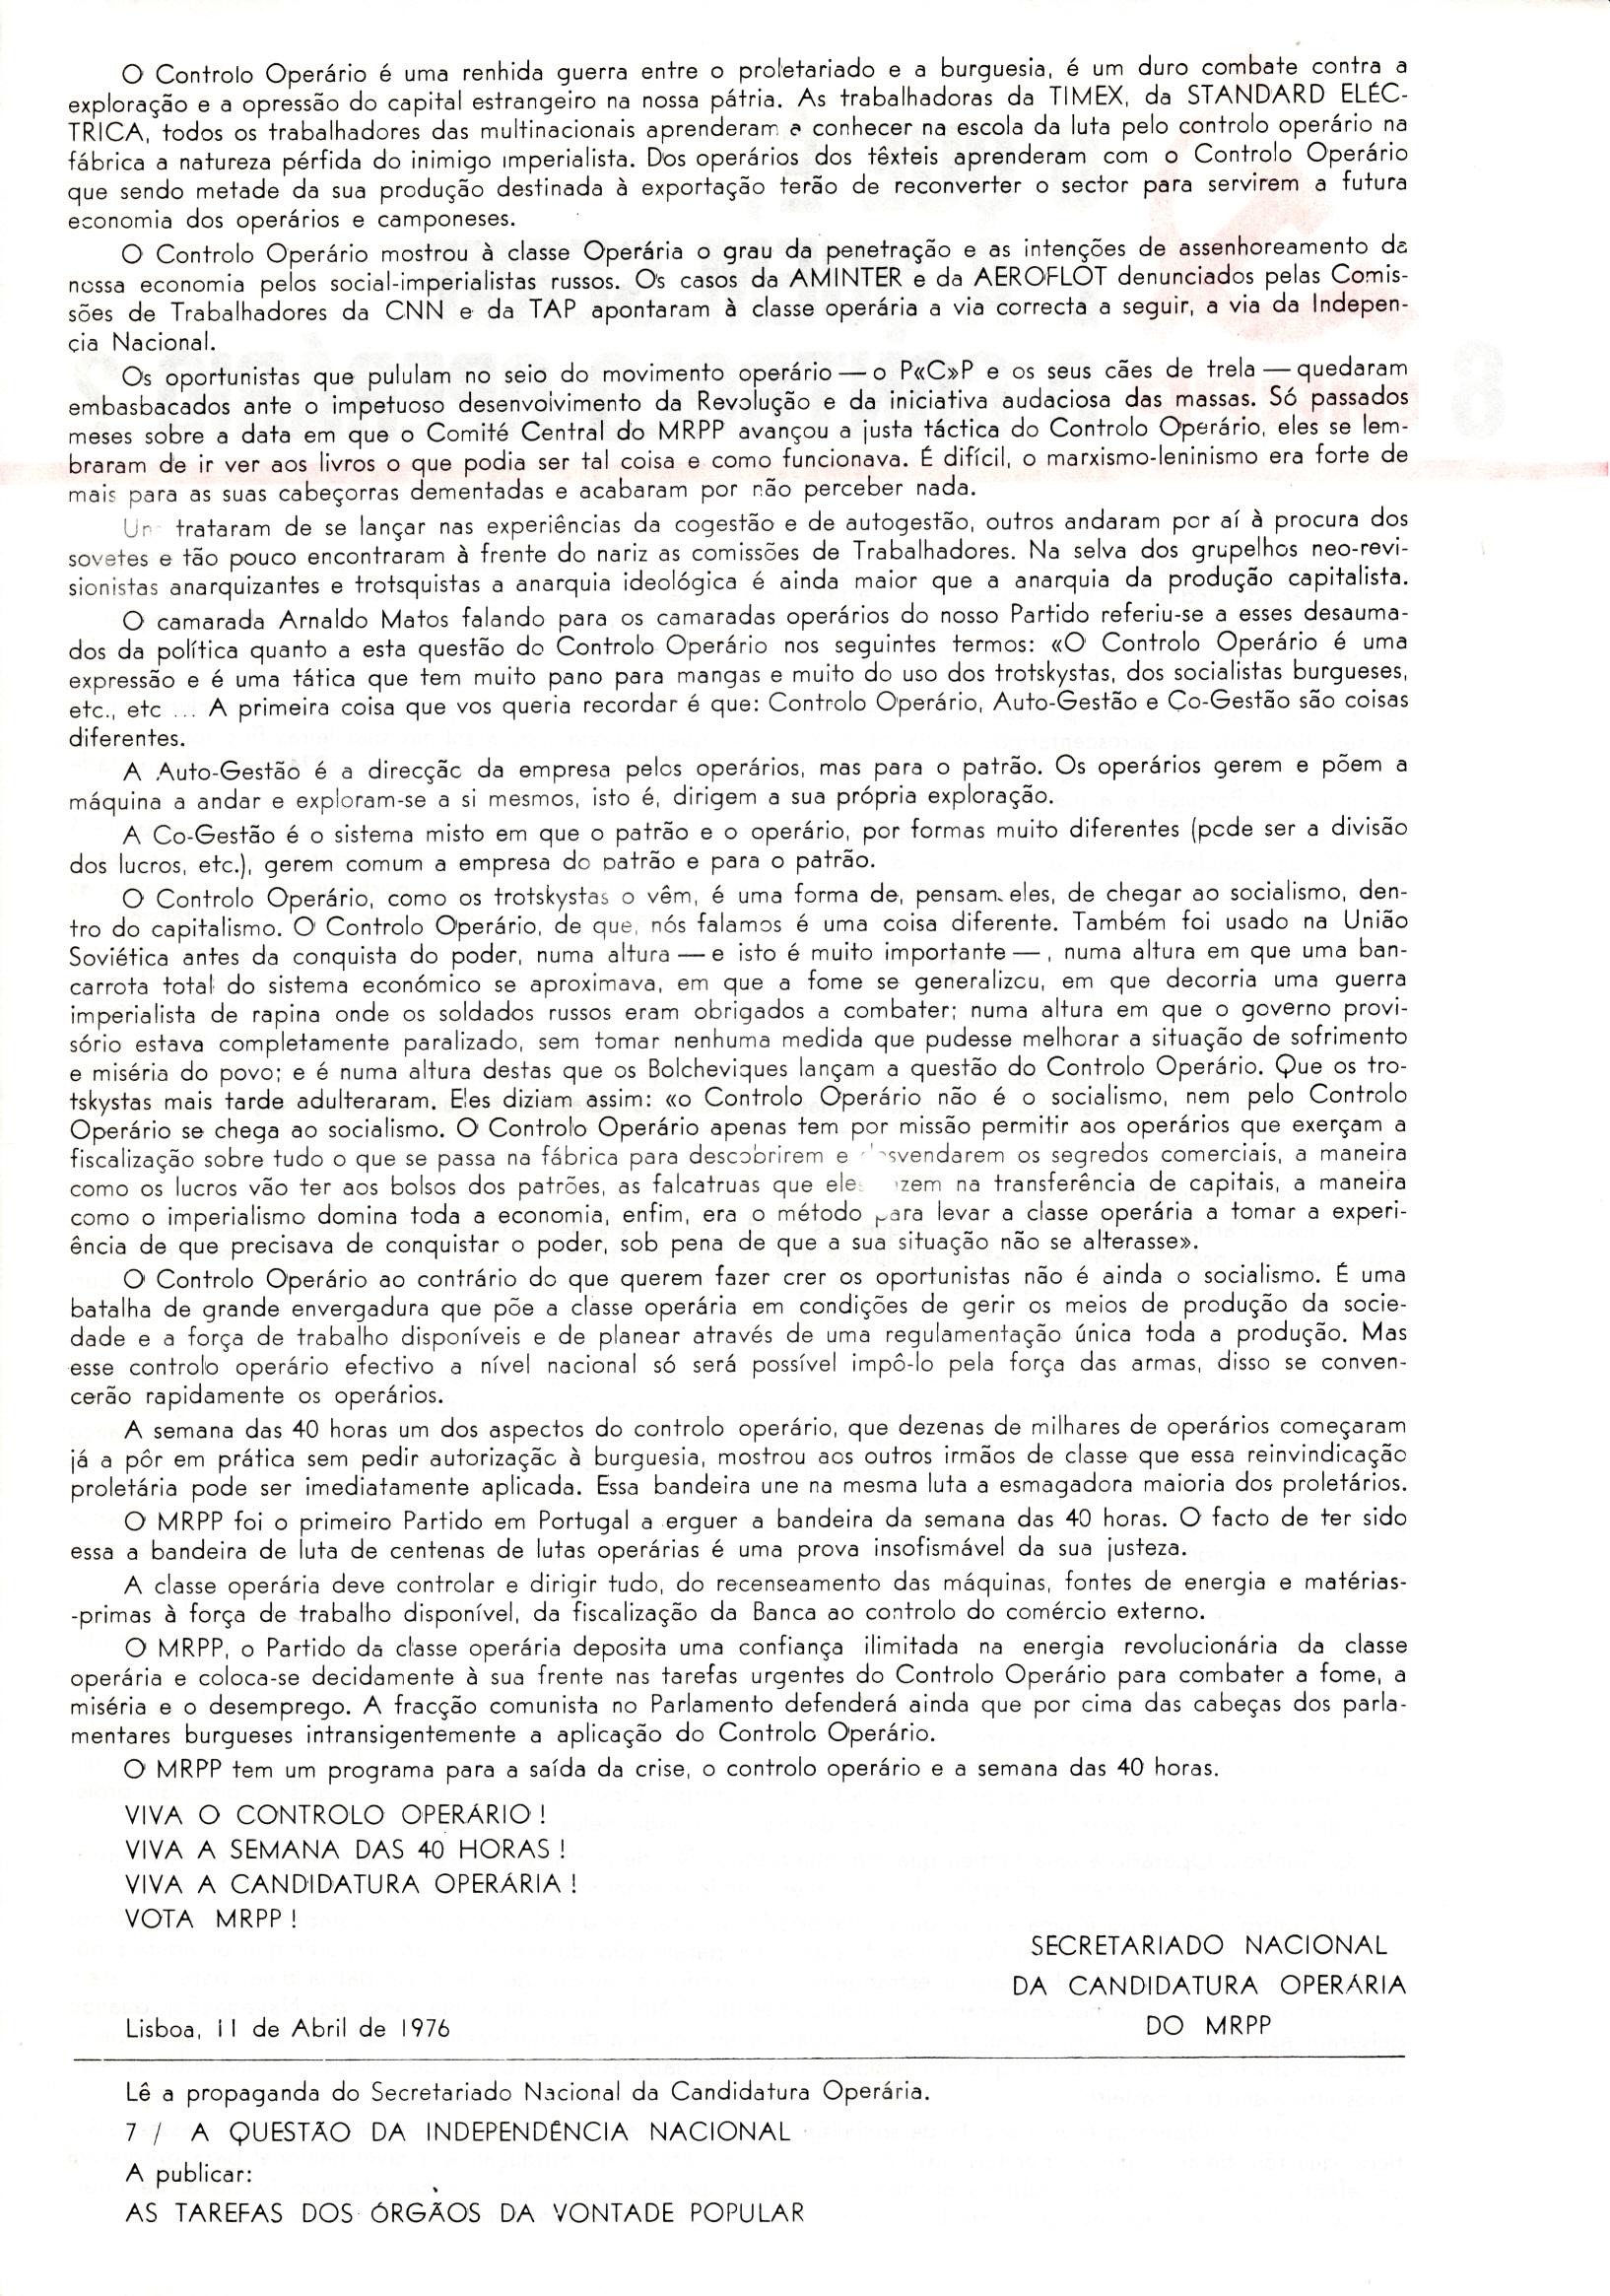 mrpp_1976_eleicao_programa_0016